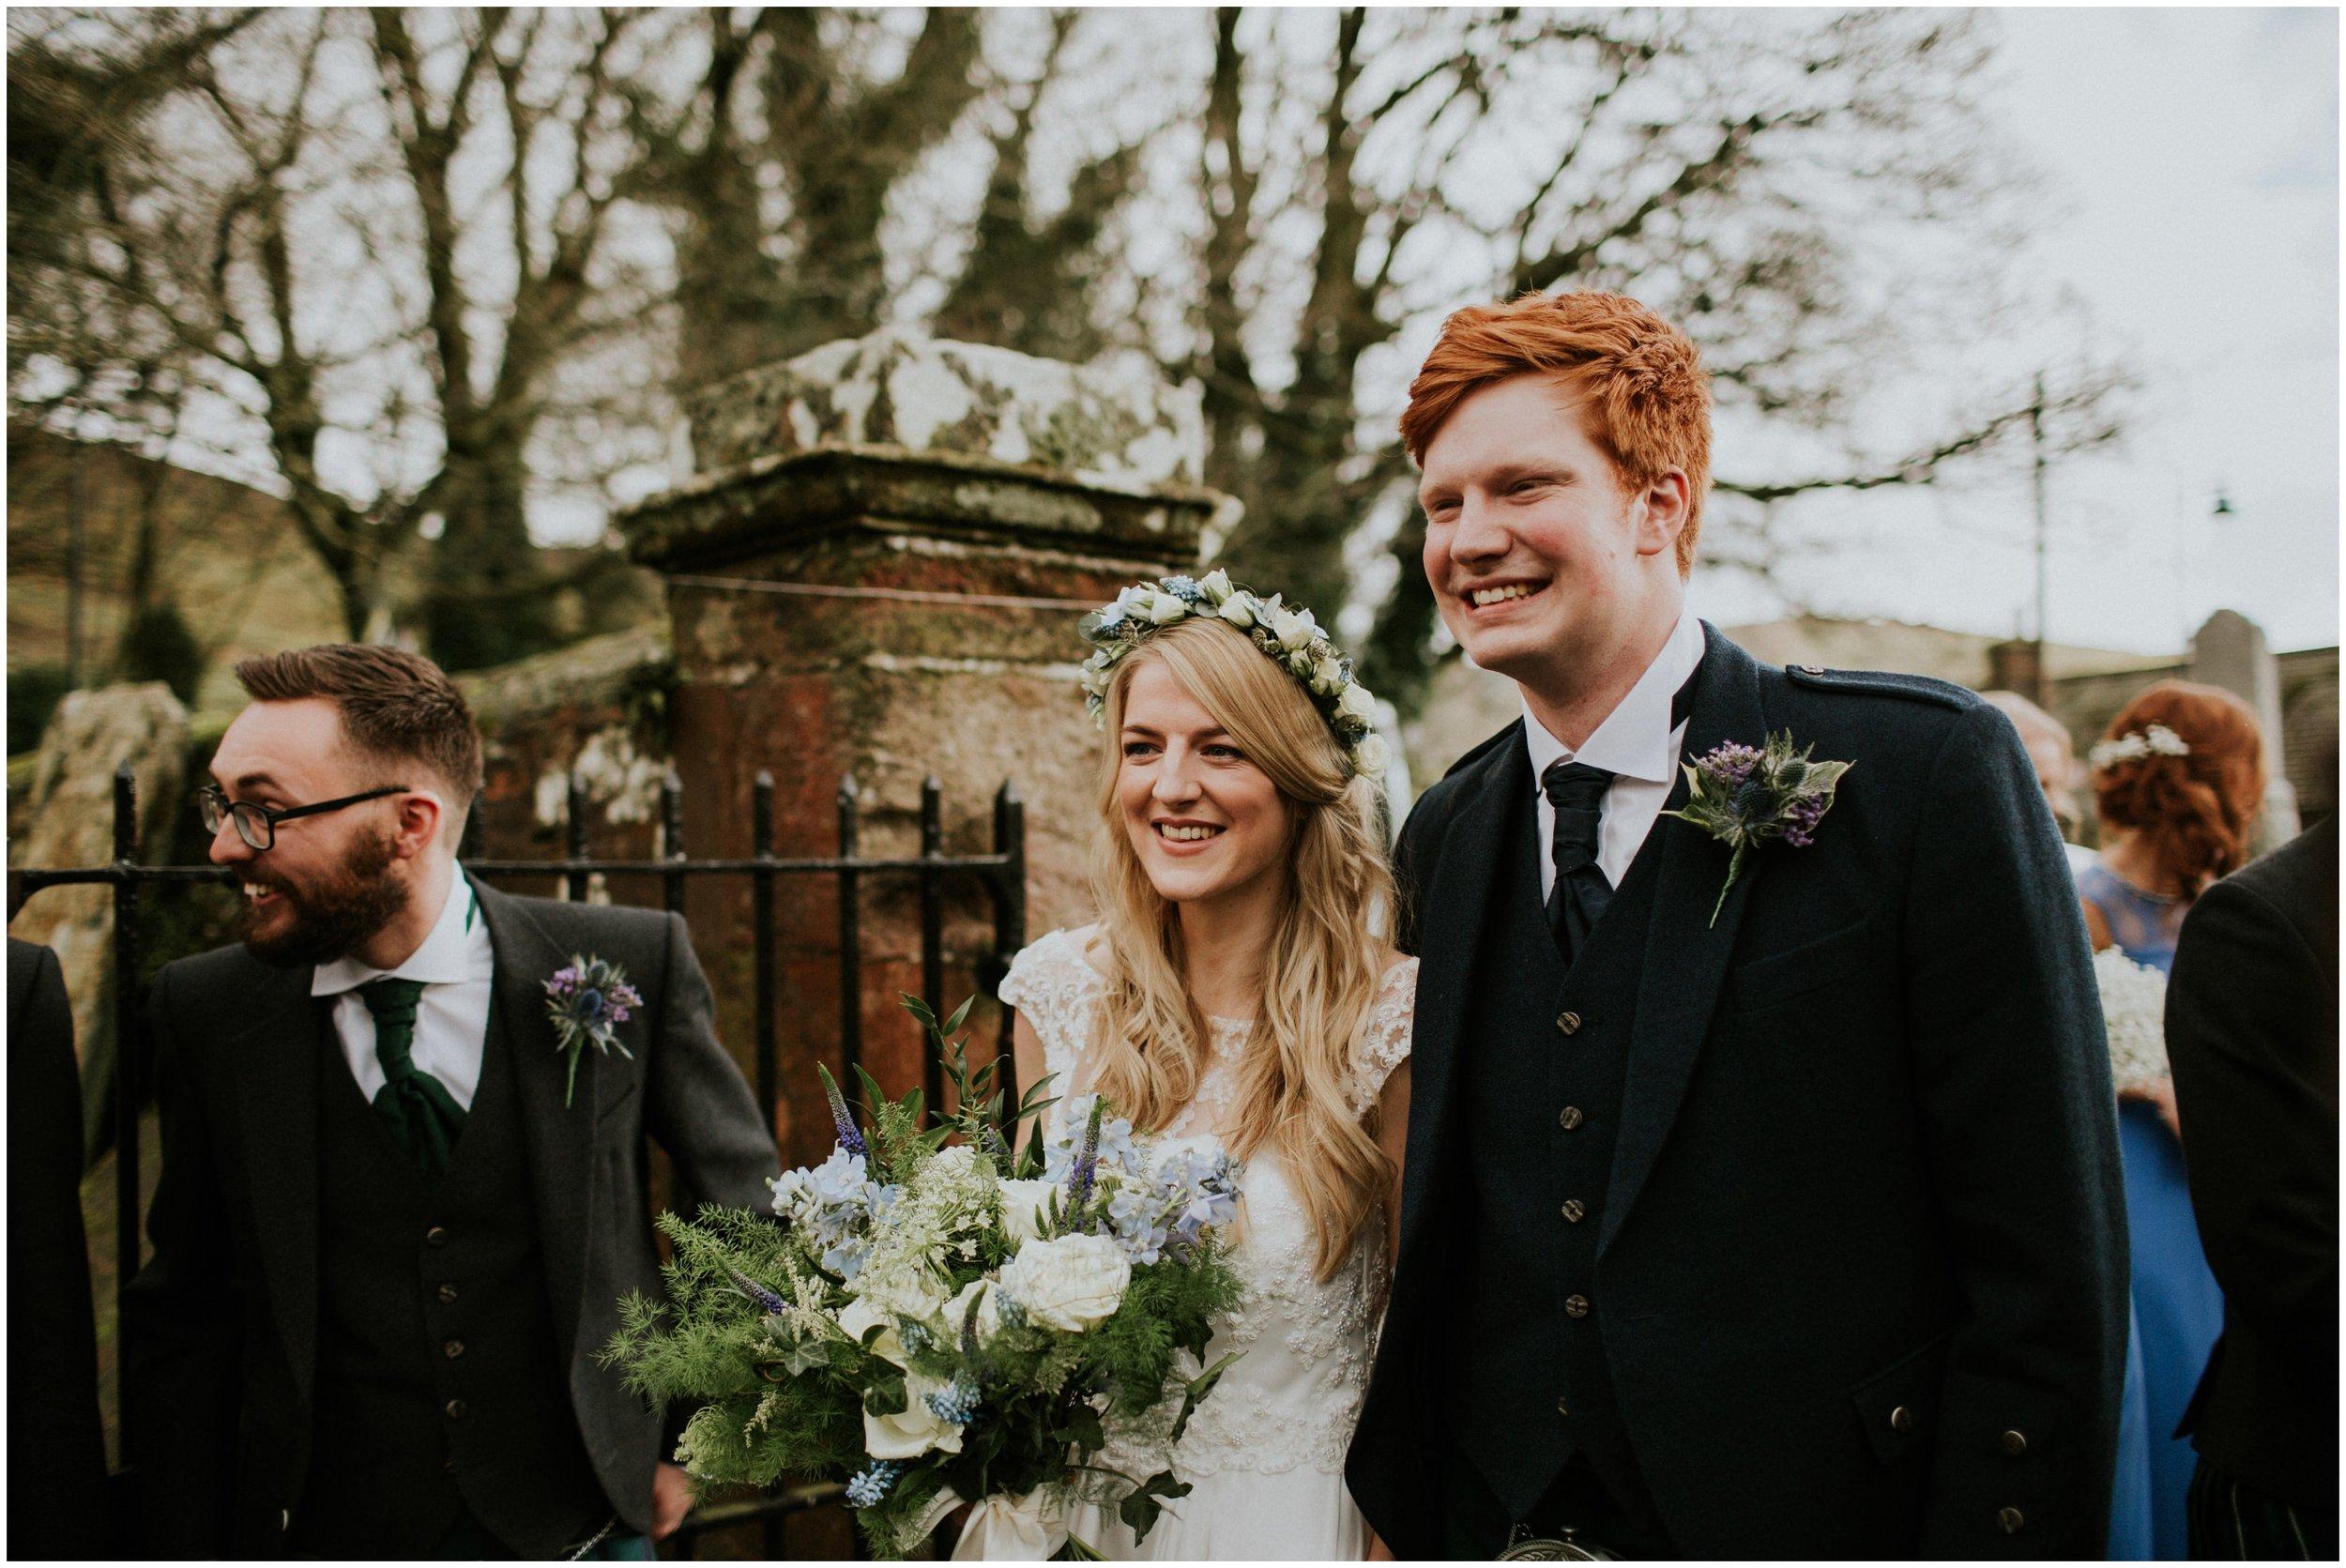 Photography 78 - Glasgow Wedding Photographer - Dave & Alana_0050.jpg